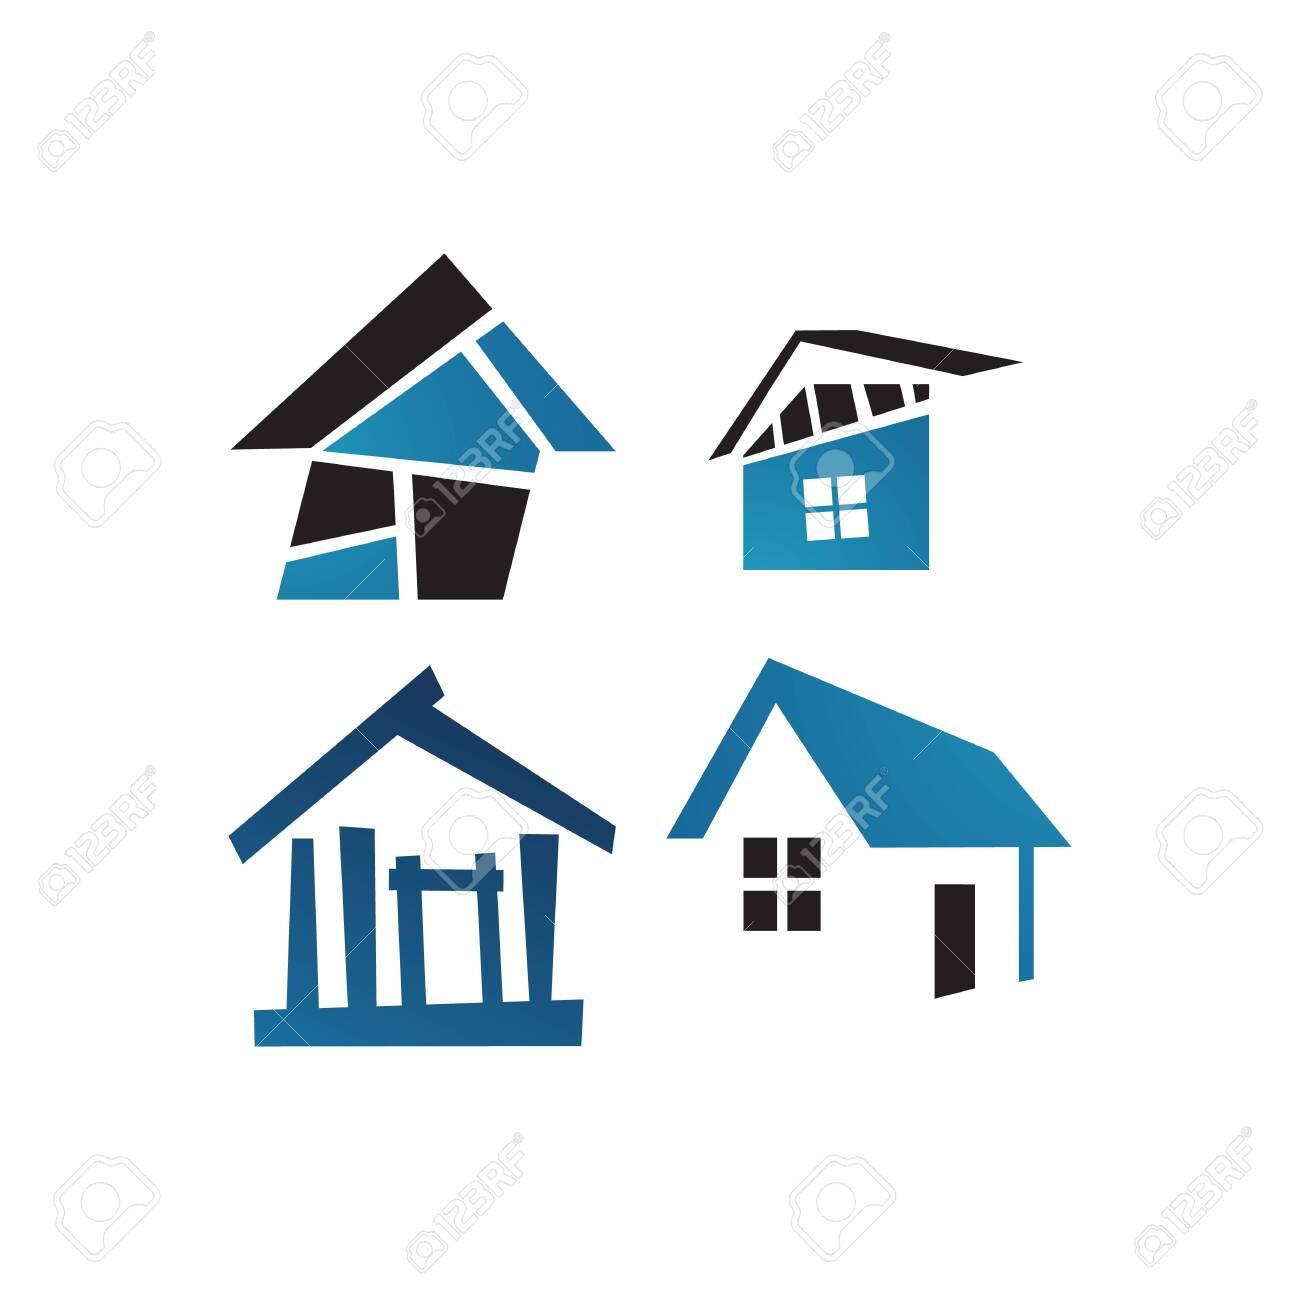 Concept And Idea Of Apartment House Realty Logo Design Vector